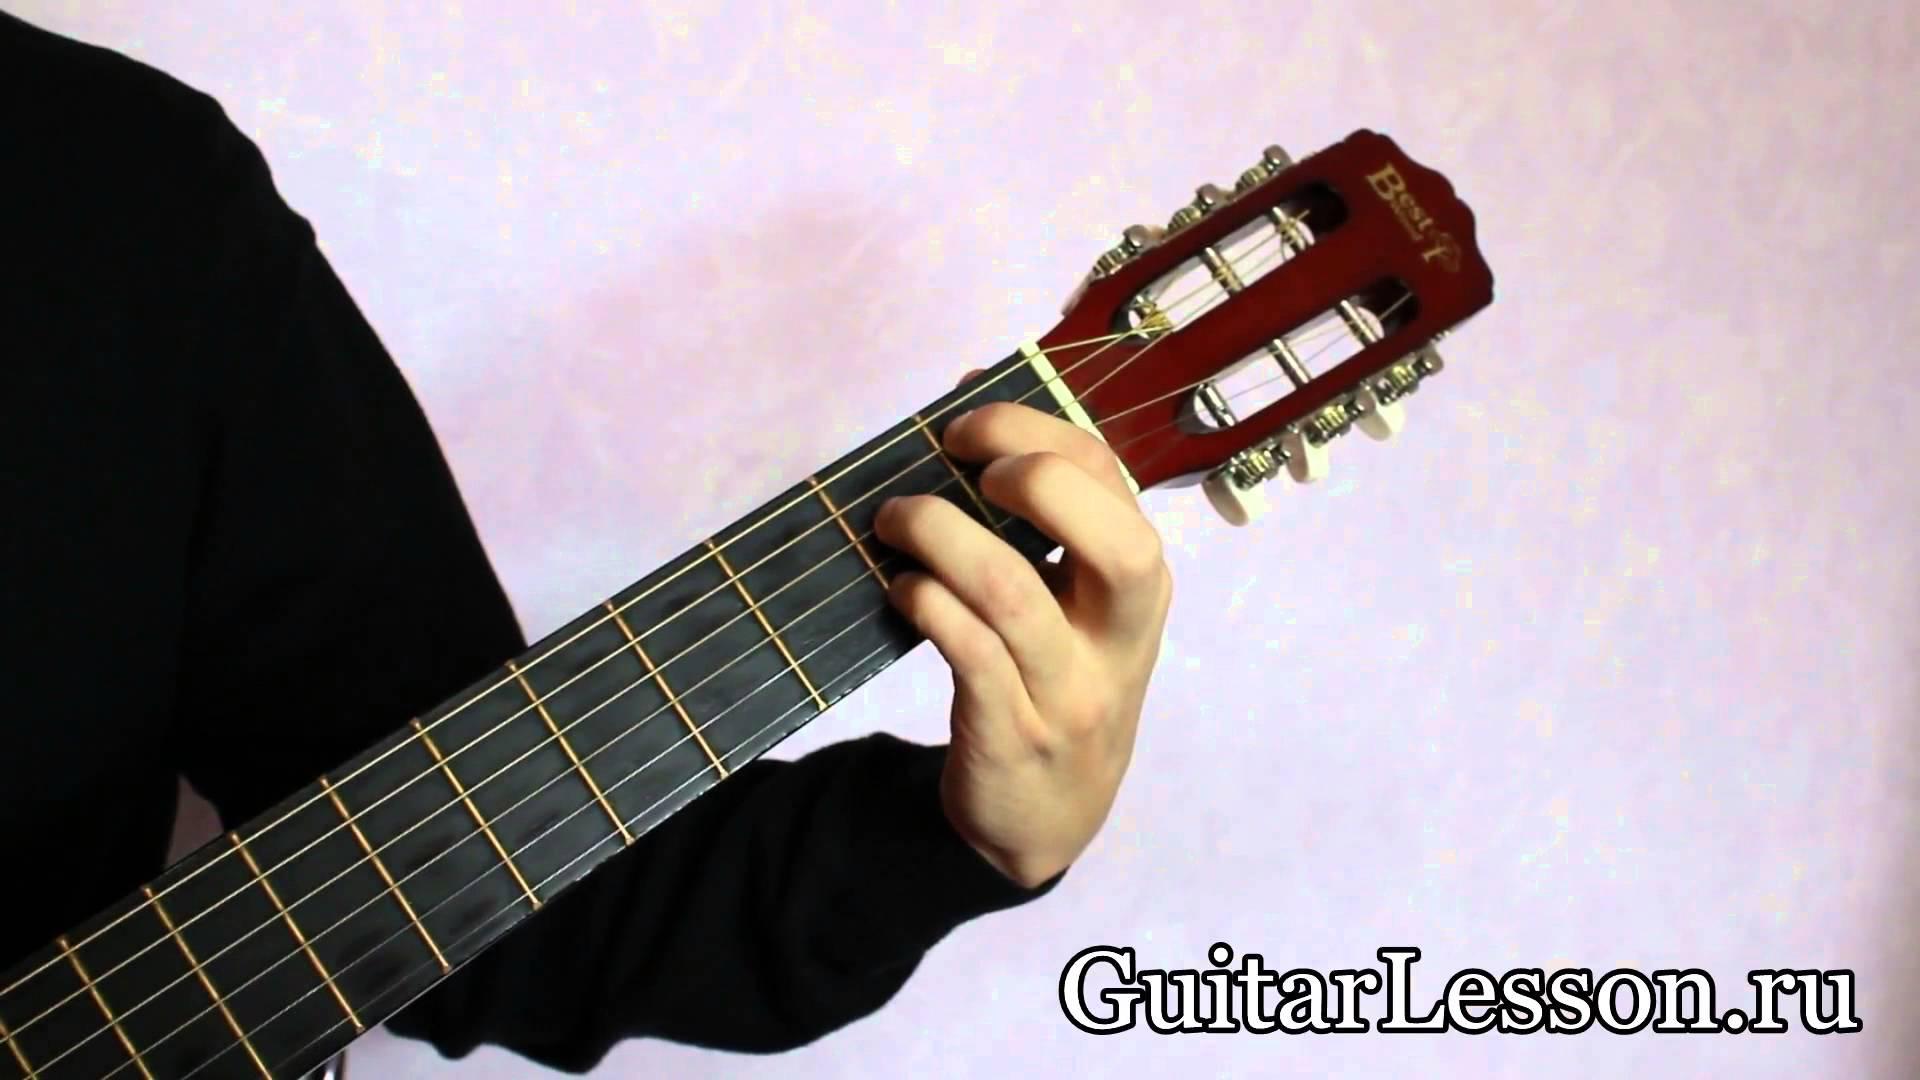 The Color Morale - 'Lifeline (Left To Write)' Guitar Walk Through